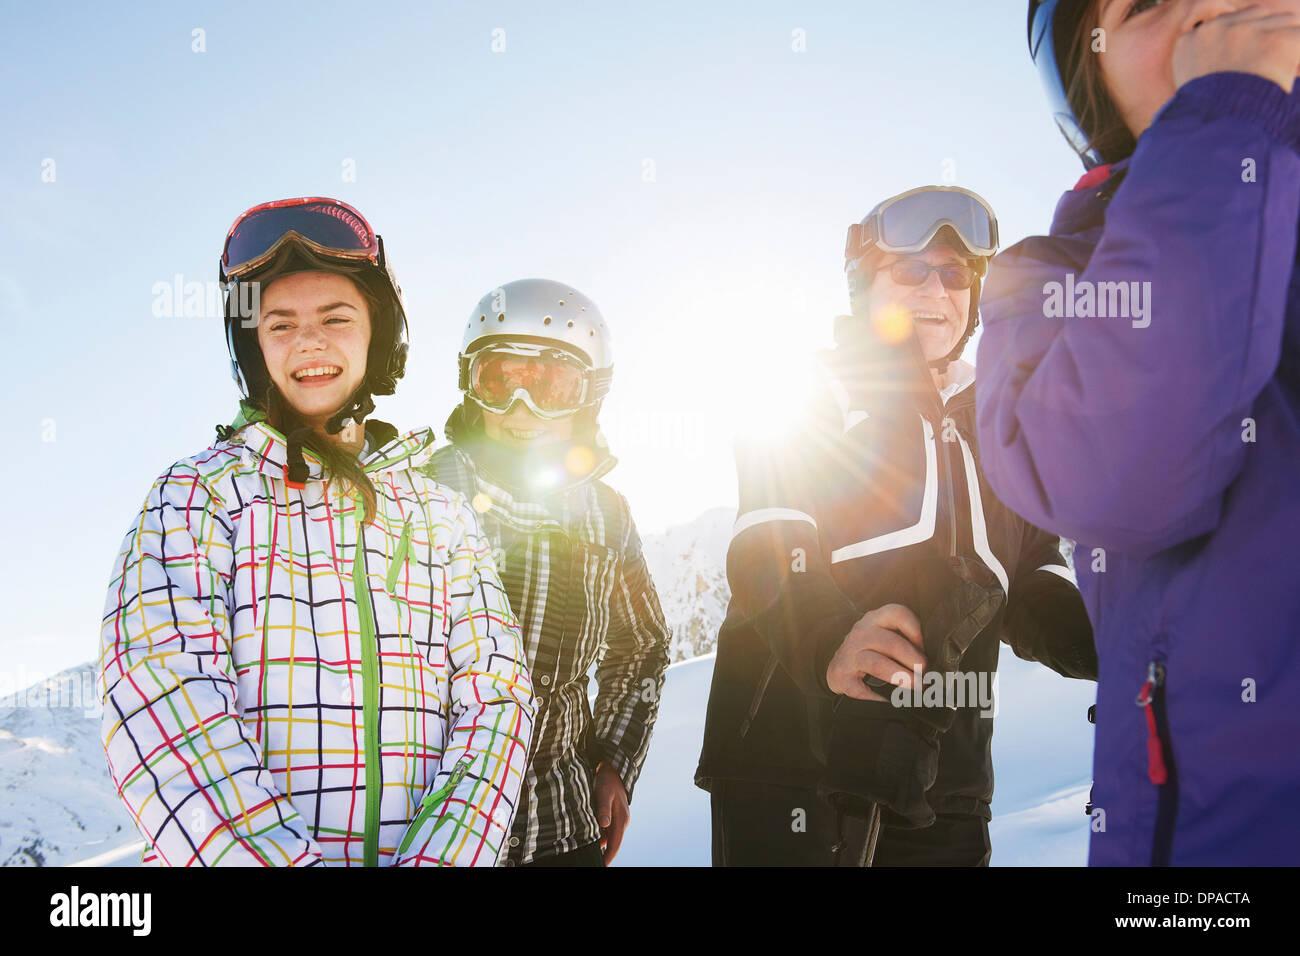 Großeltern und Enkelinnen, Les Arcs, Haute-Savoie, Frankreich Stockbild